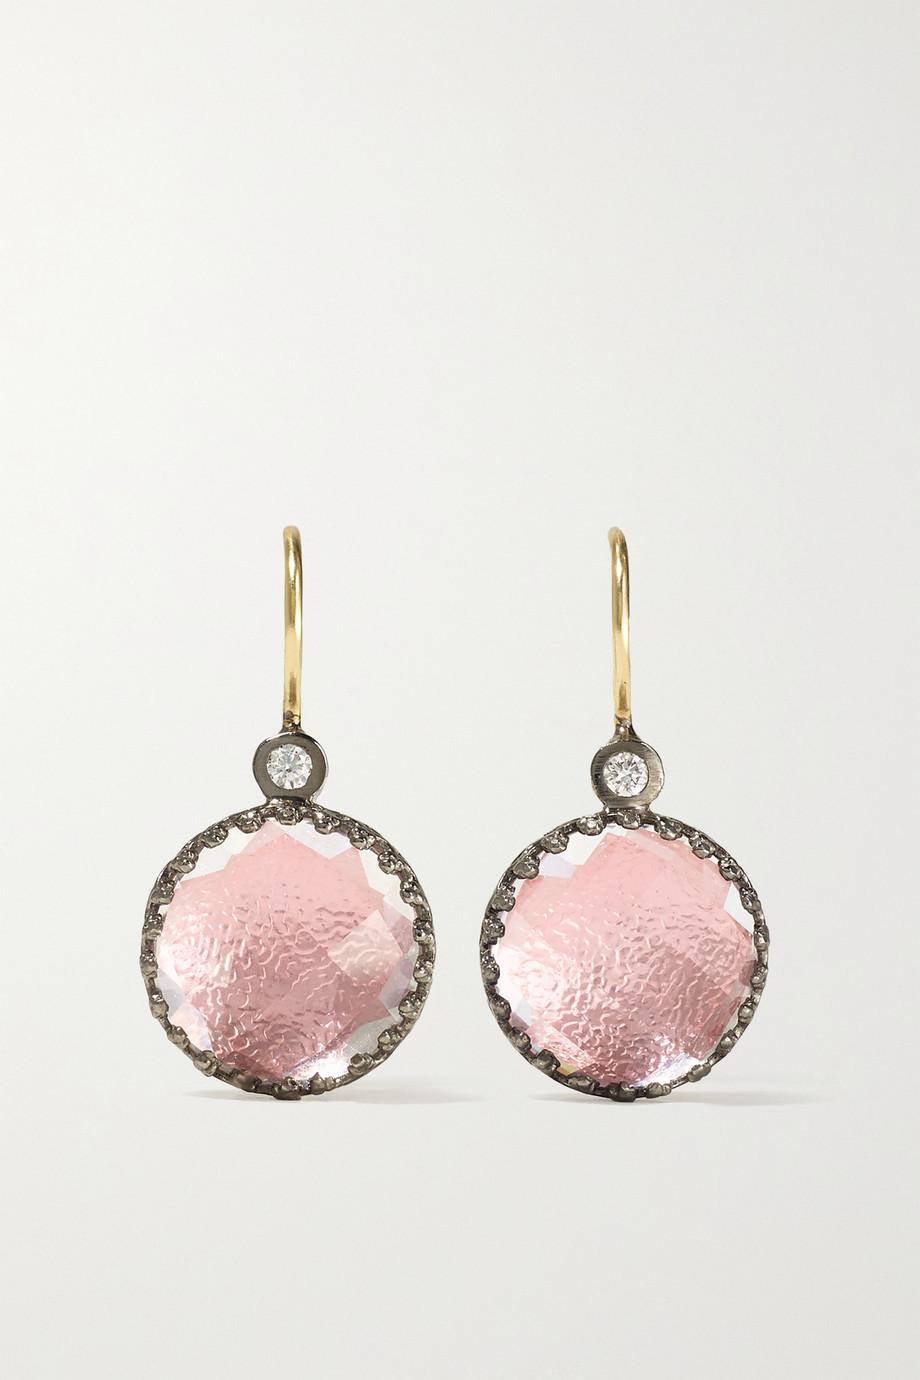 Larkspur & Hawk Olivia Button rhodium-dipped quartz and diamond earrings